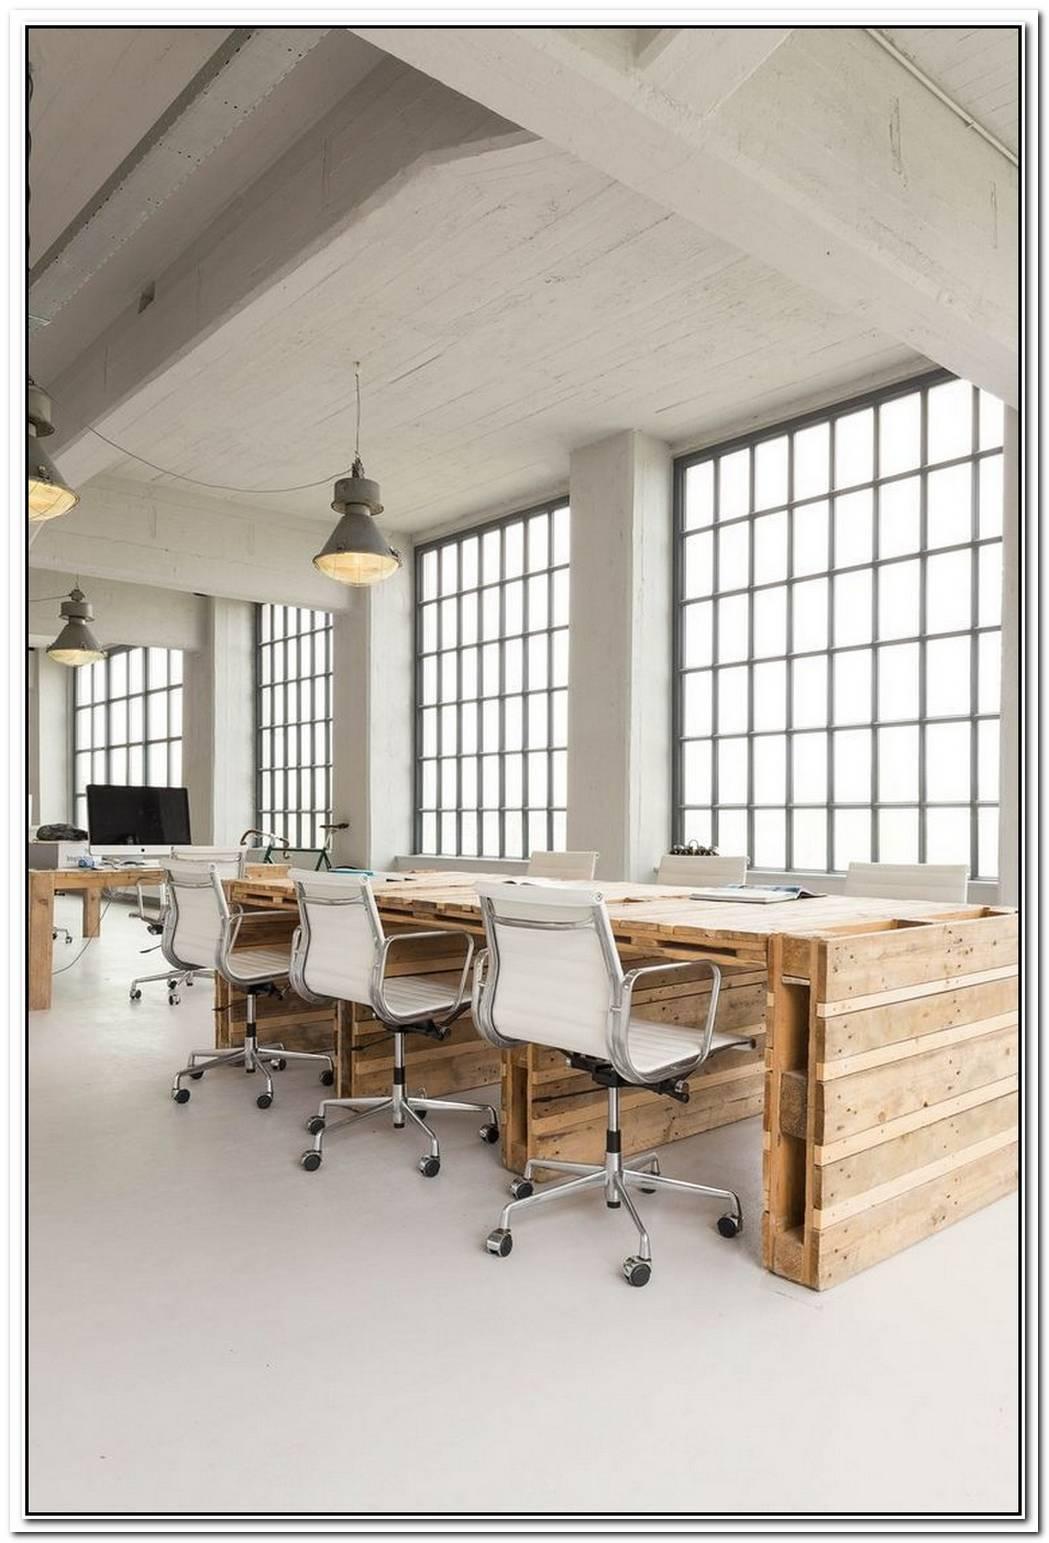 Wonderful Office Space By Pottgiesser